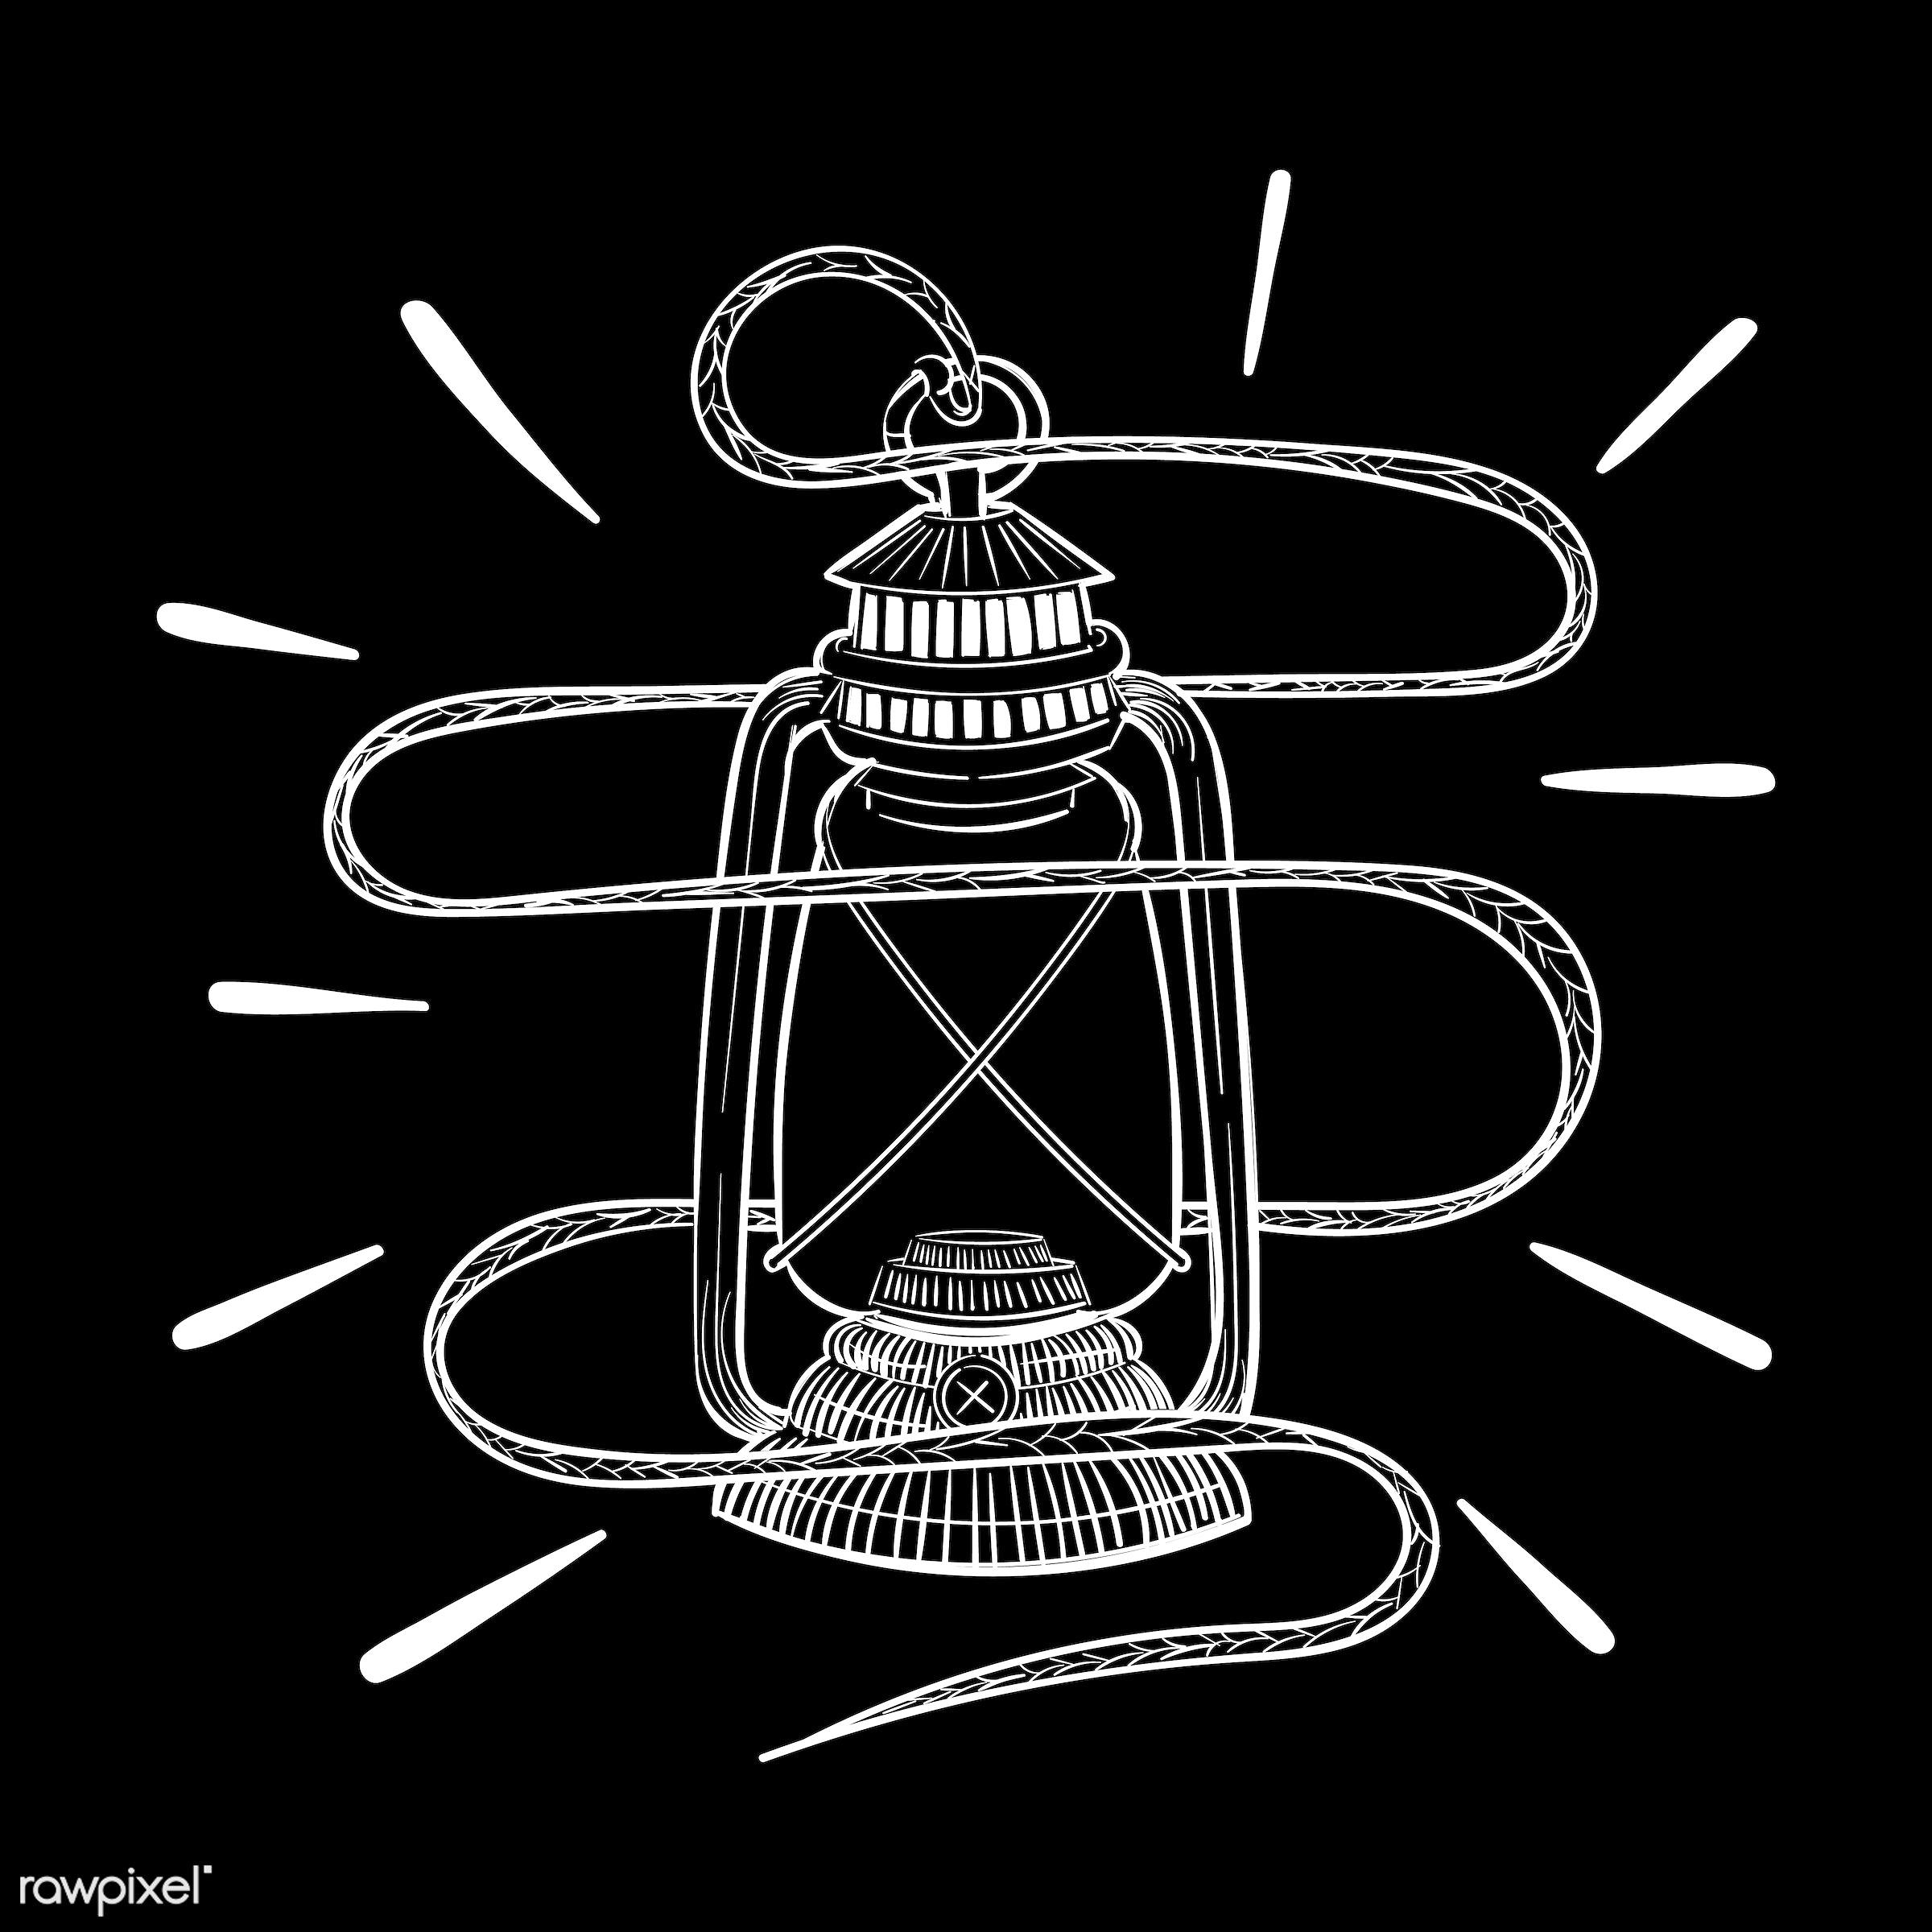 Hand drawing illustration set of wanderlust icons - adventure, art, artwork, camp, camping, creative, creativity, design,...